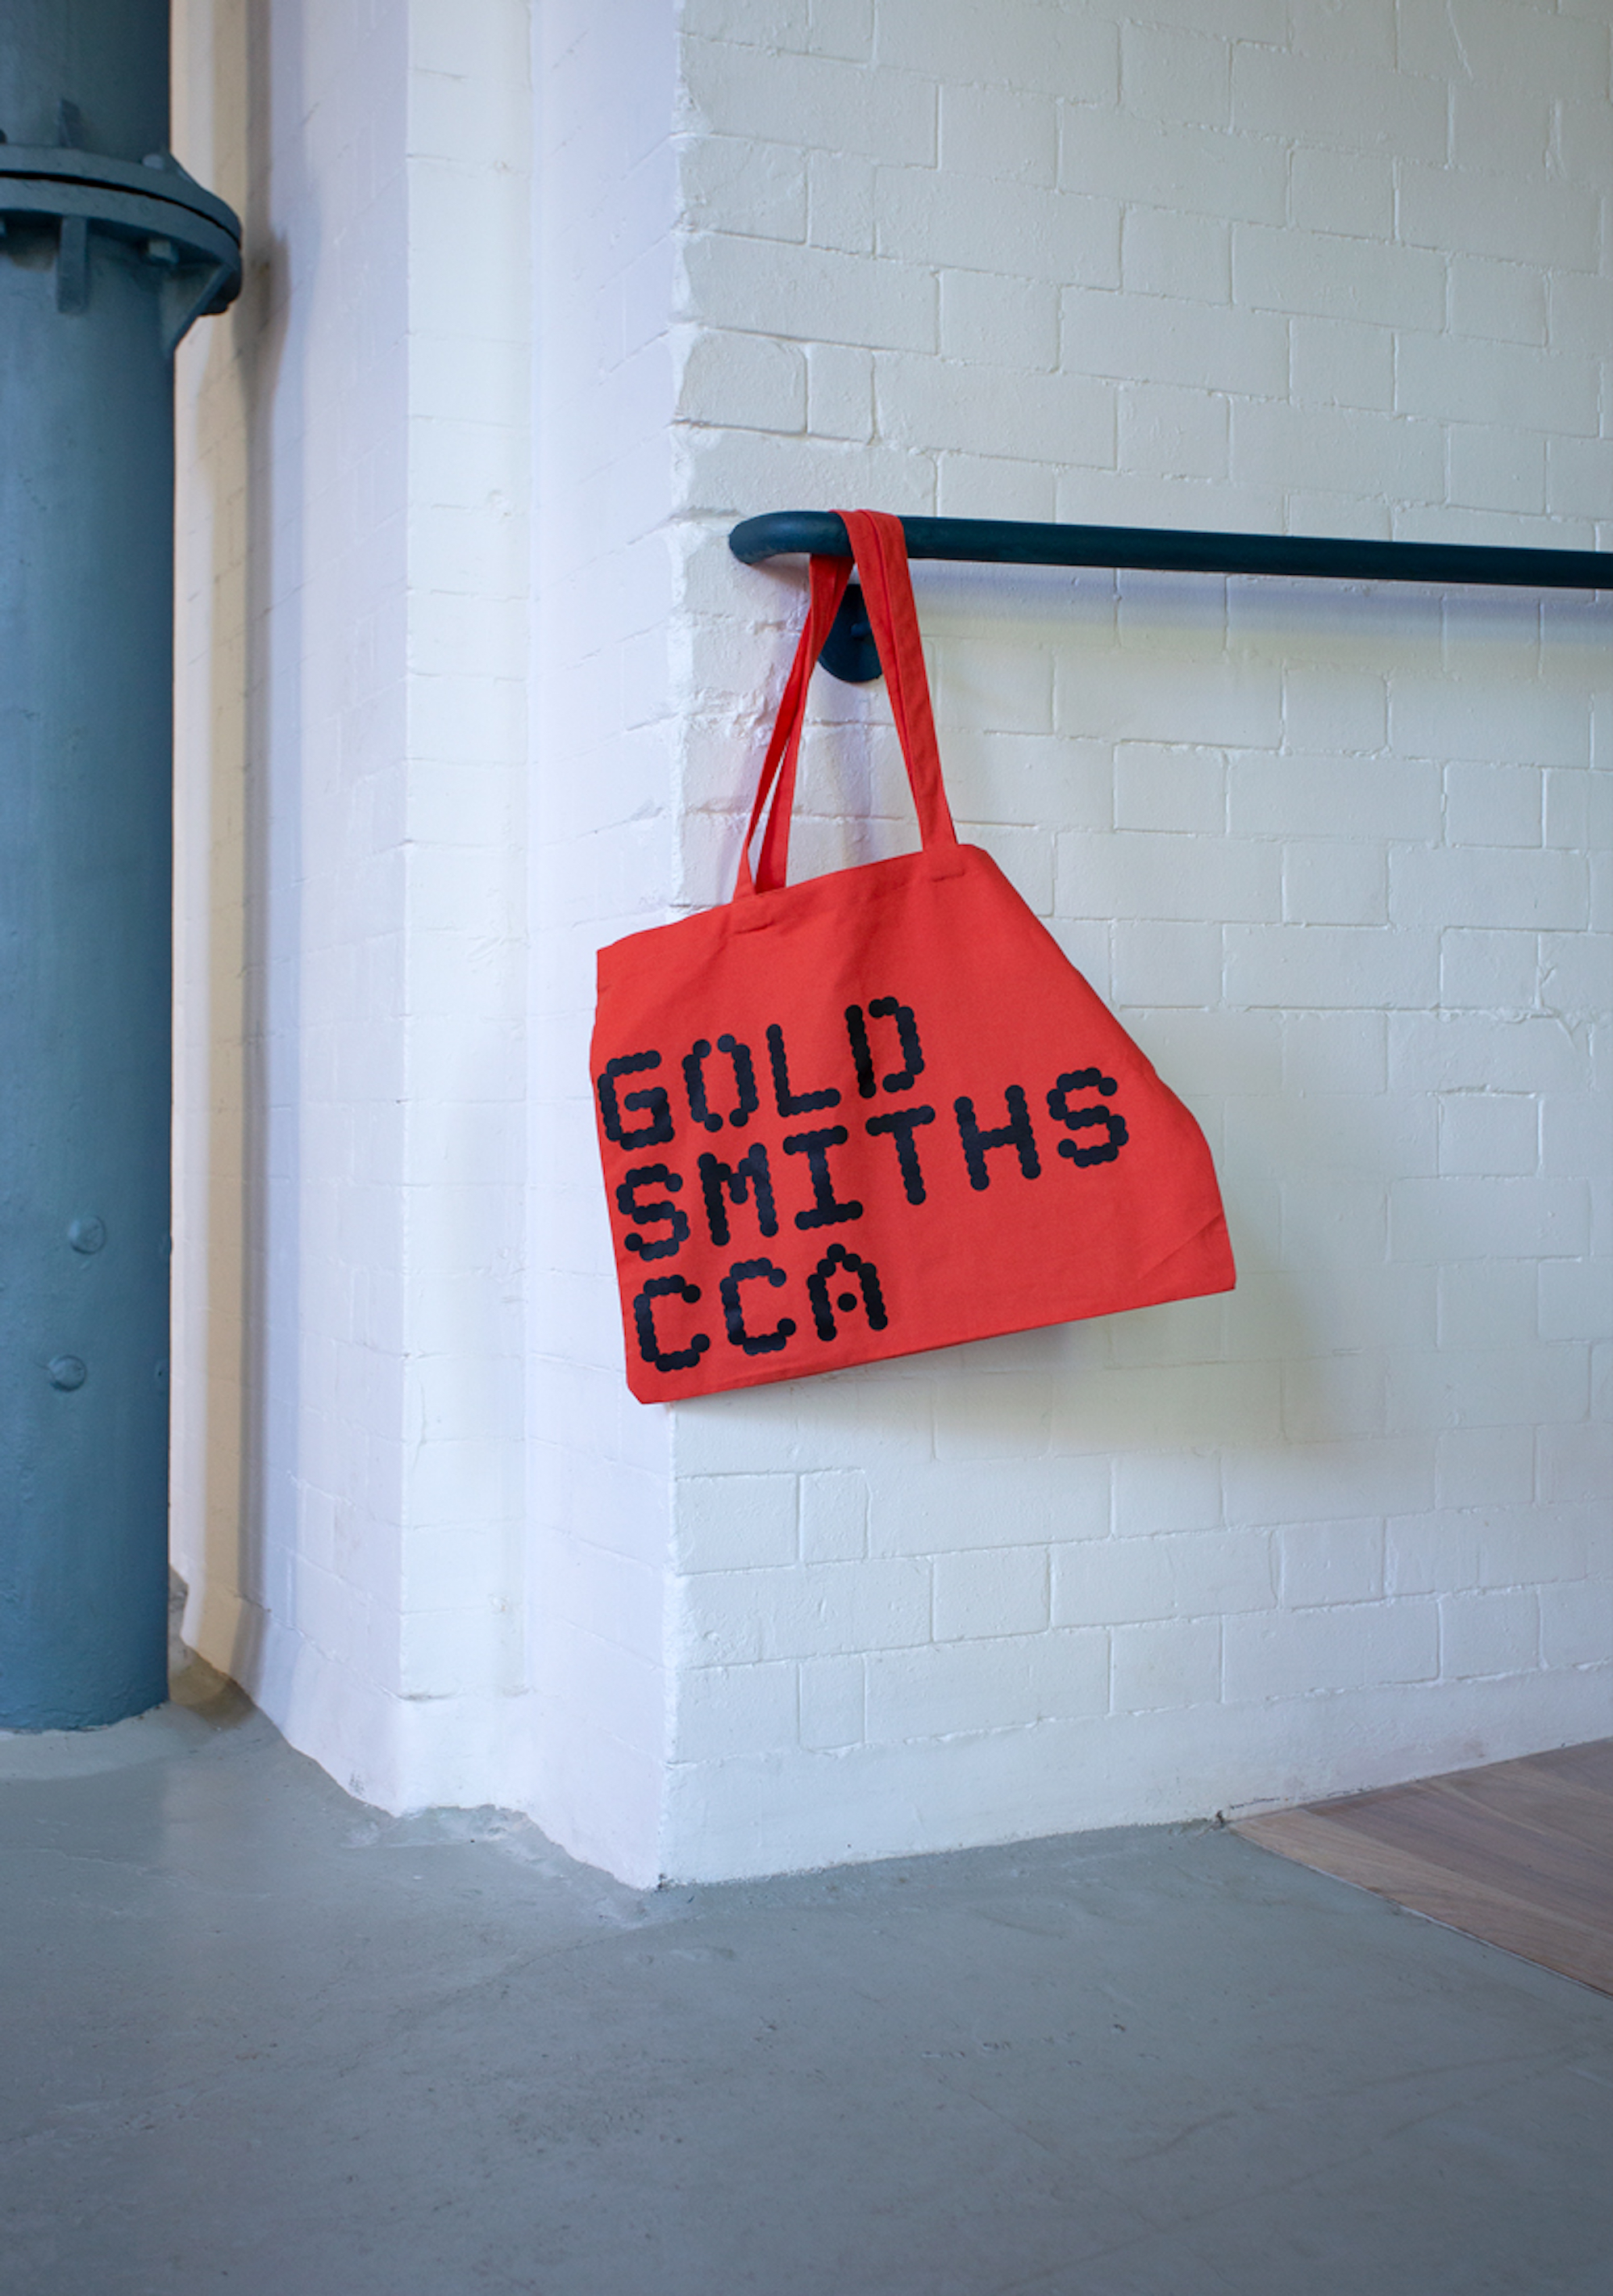 Goldsmiths CCA tote bag designed by Kellenberger White